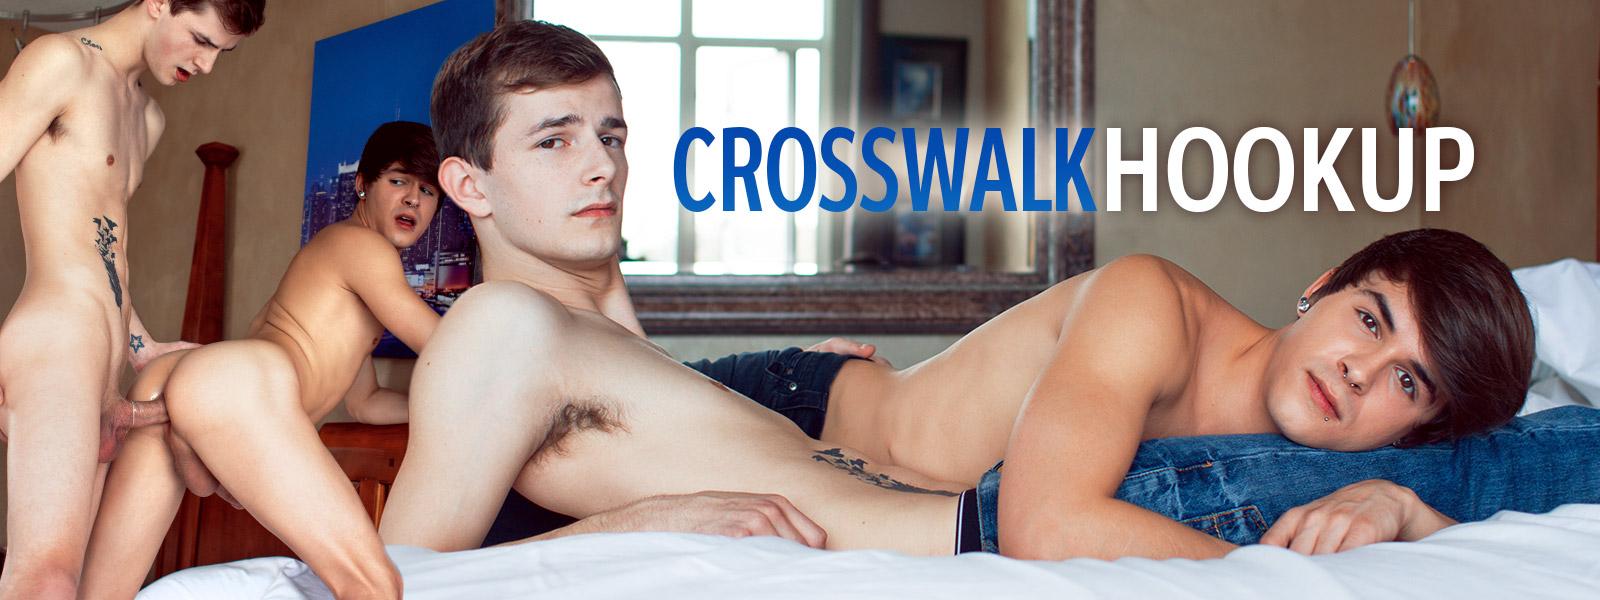 Crosswalk Hookup